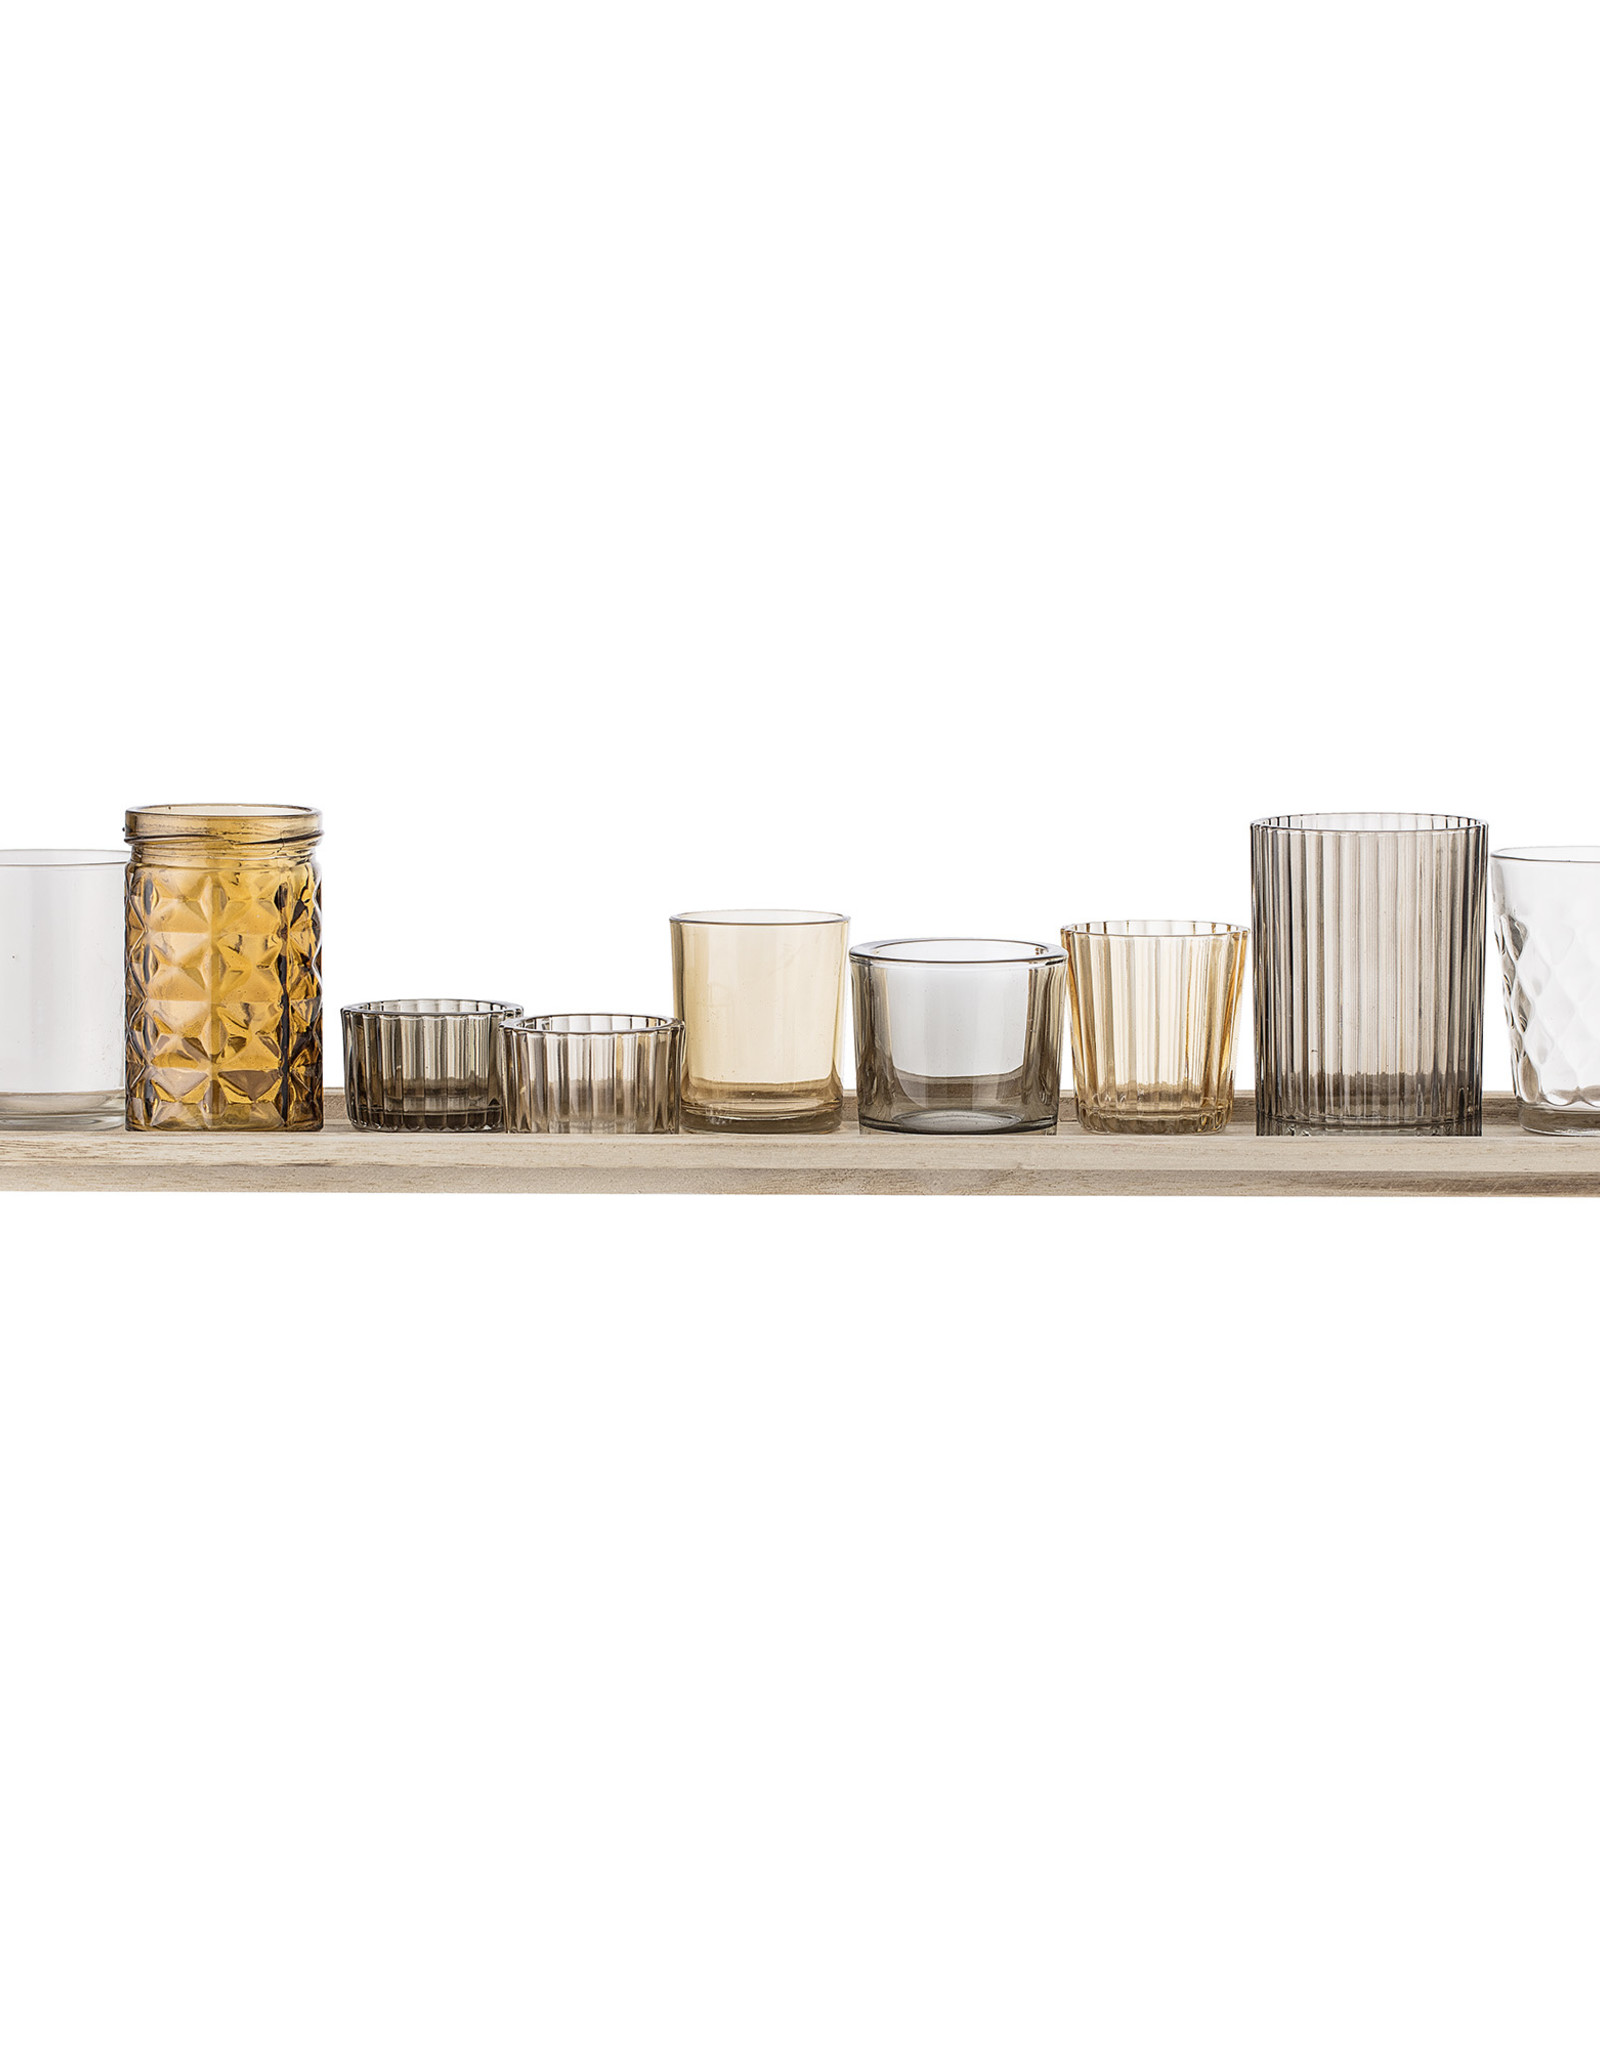 Bloomingville Bloomingville - Waxinelichtjes - Glas/Hout - Bruin - set van 10 - L56xH10xB14 cm